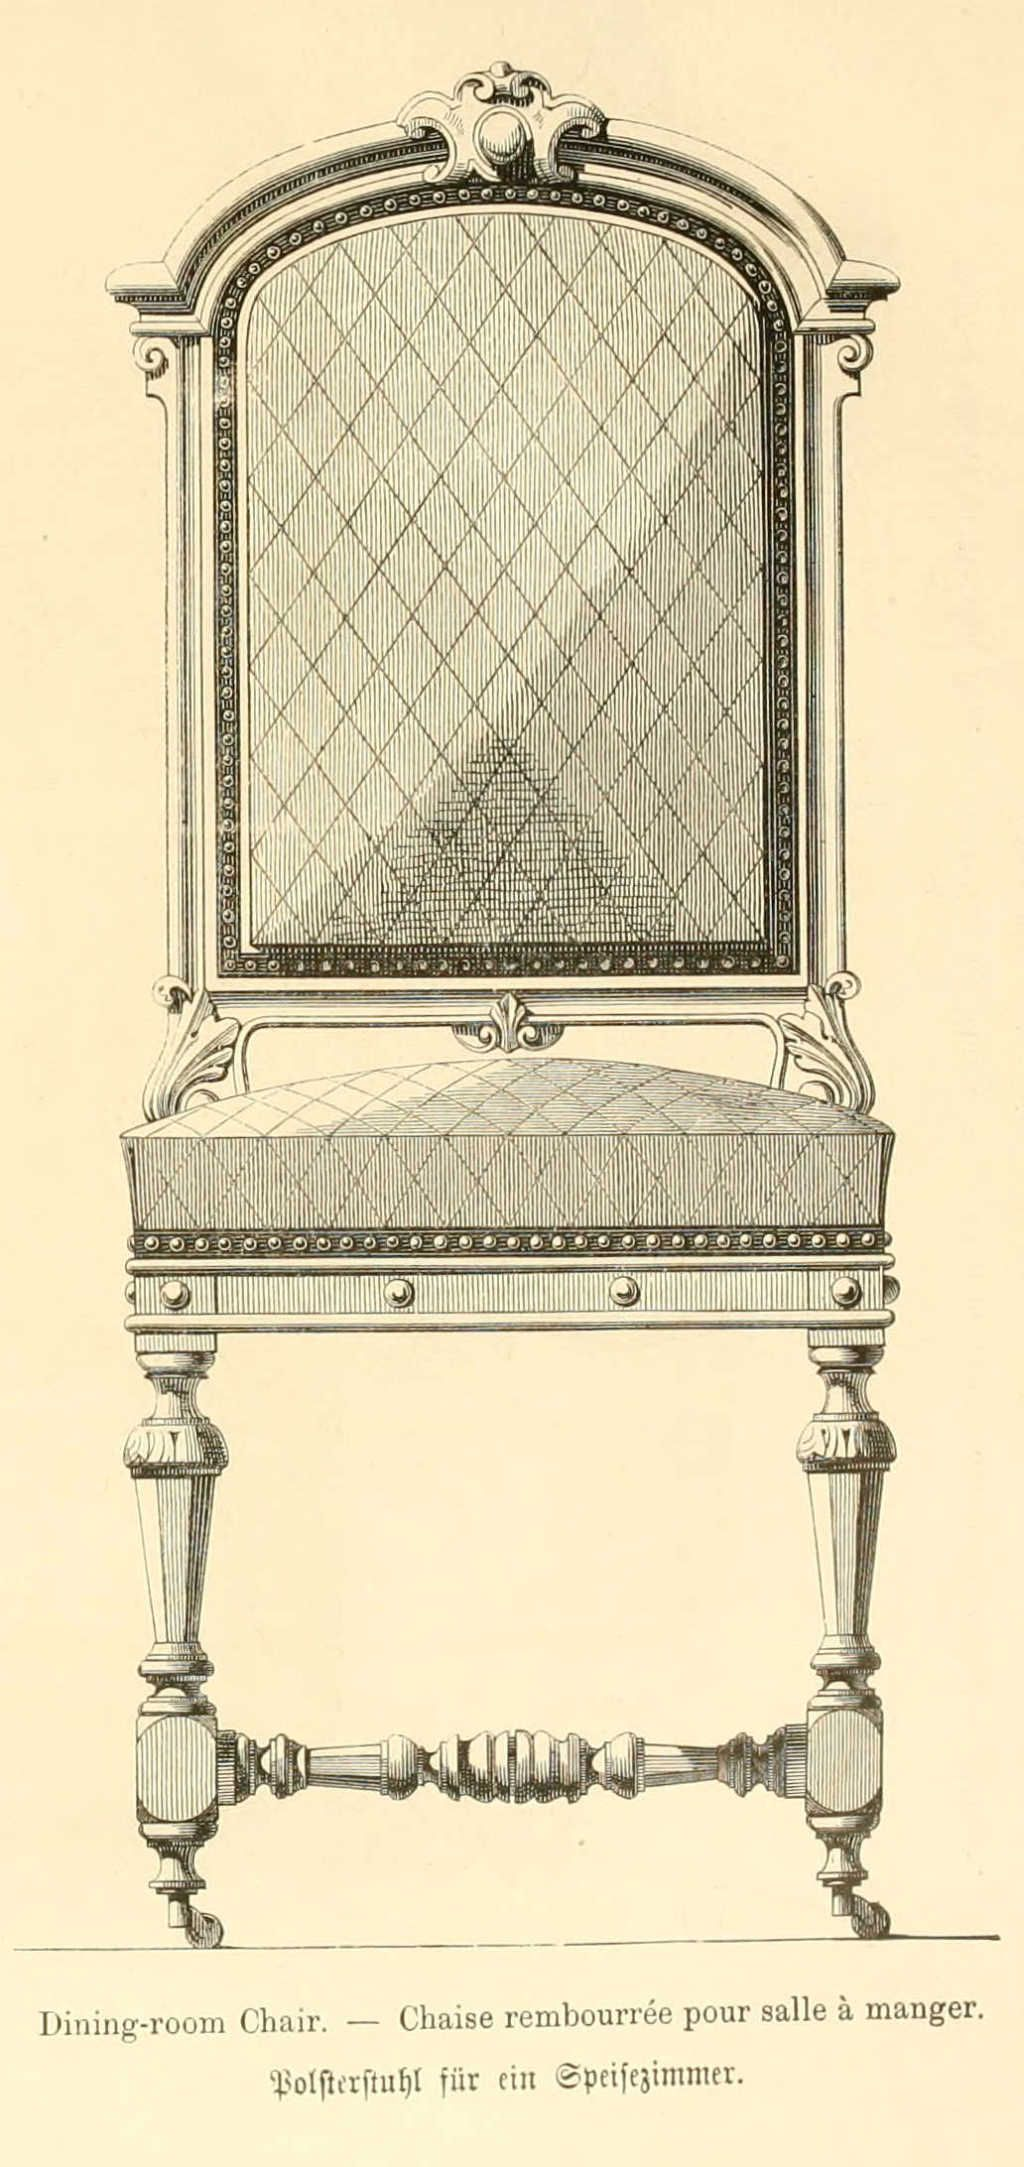 Img/dessins Meubles Mobilier/chaise Rembouree Pour Salle A Manger